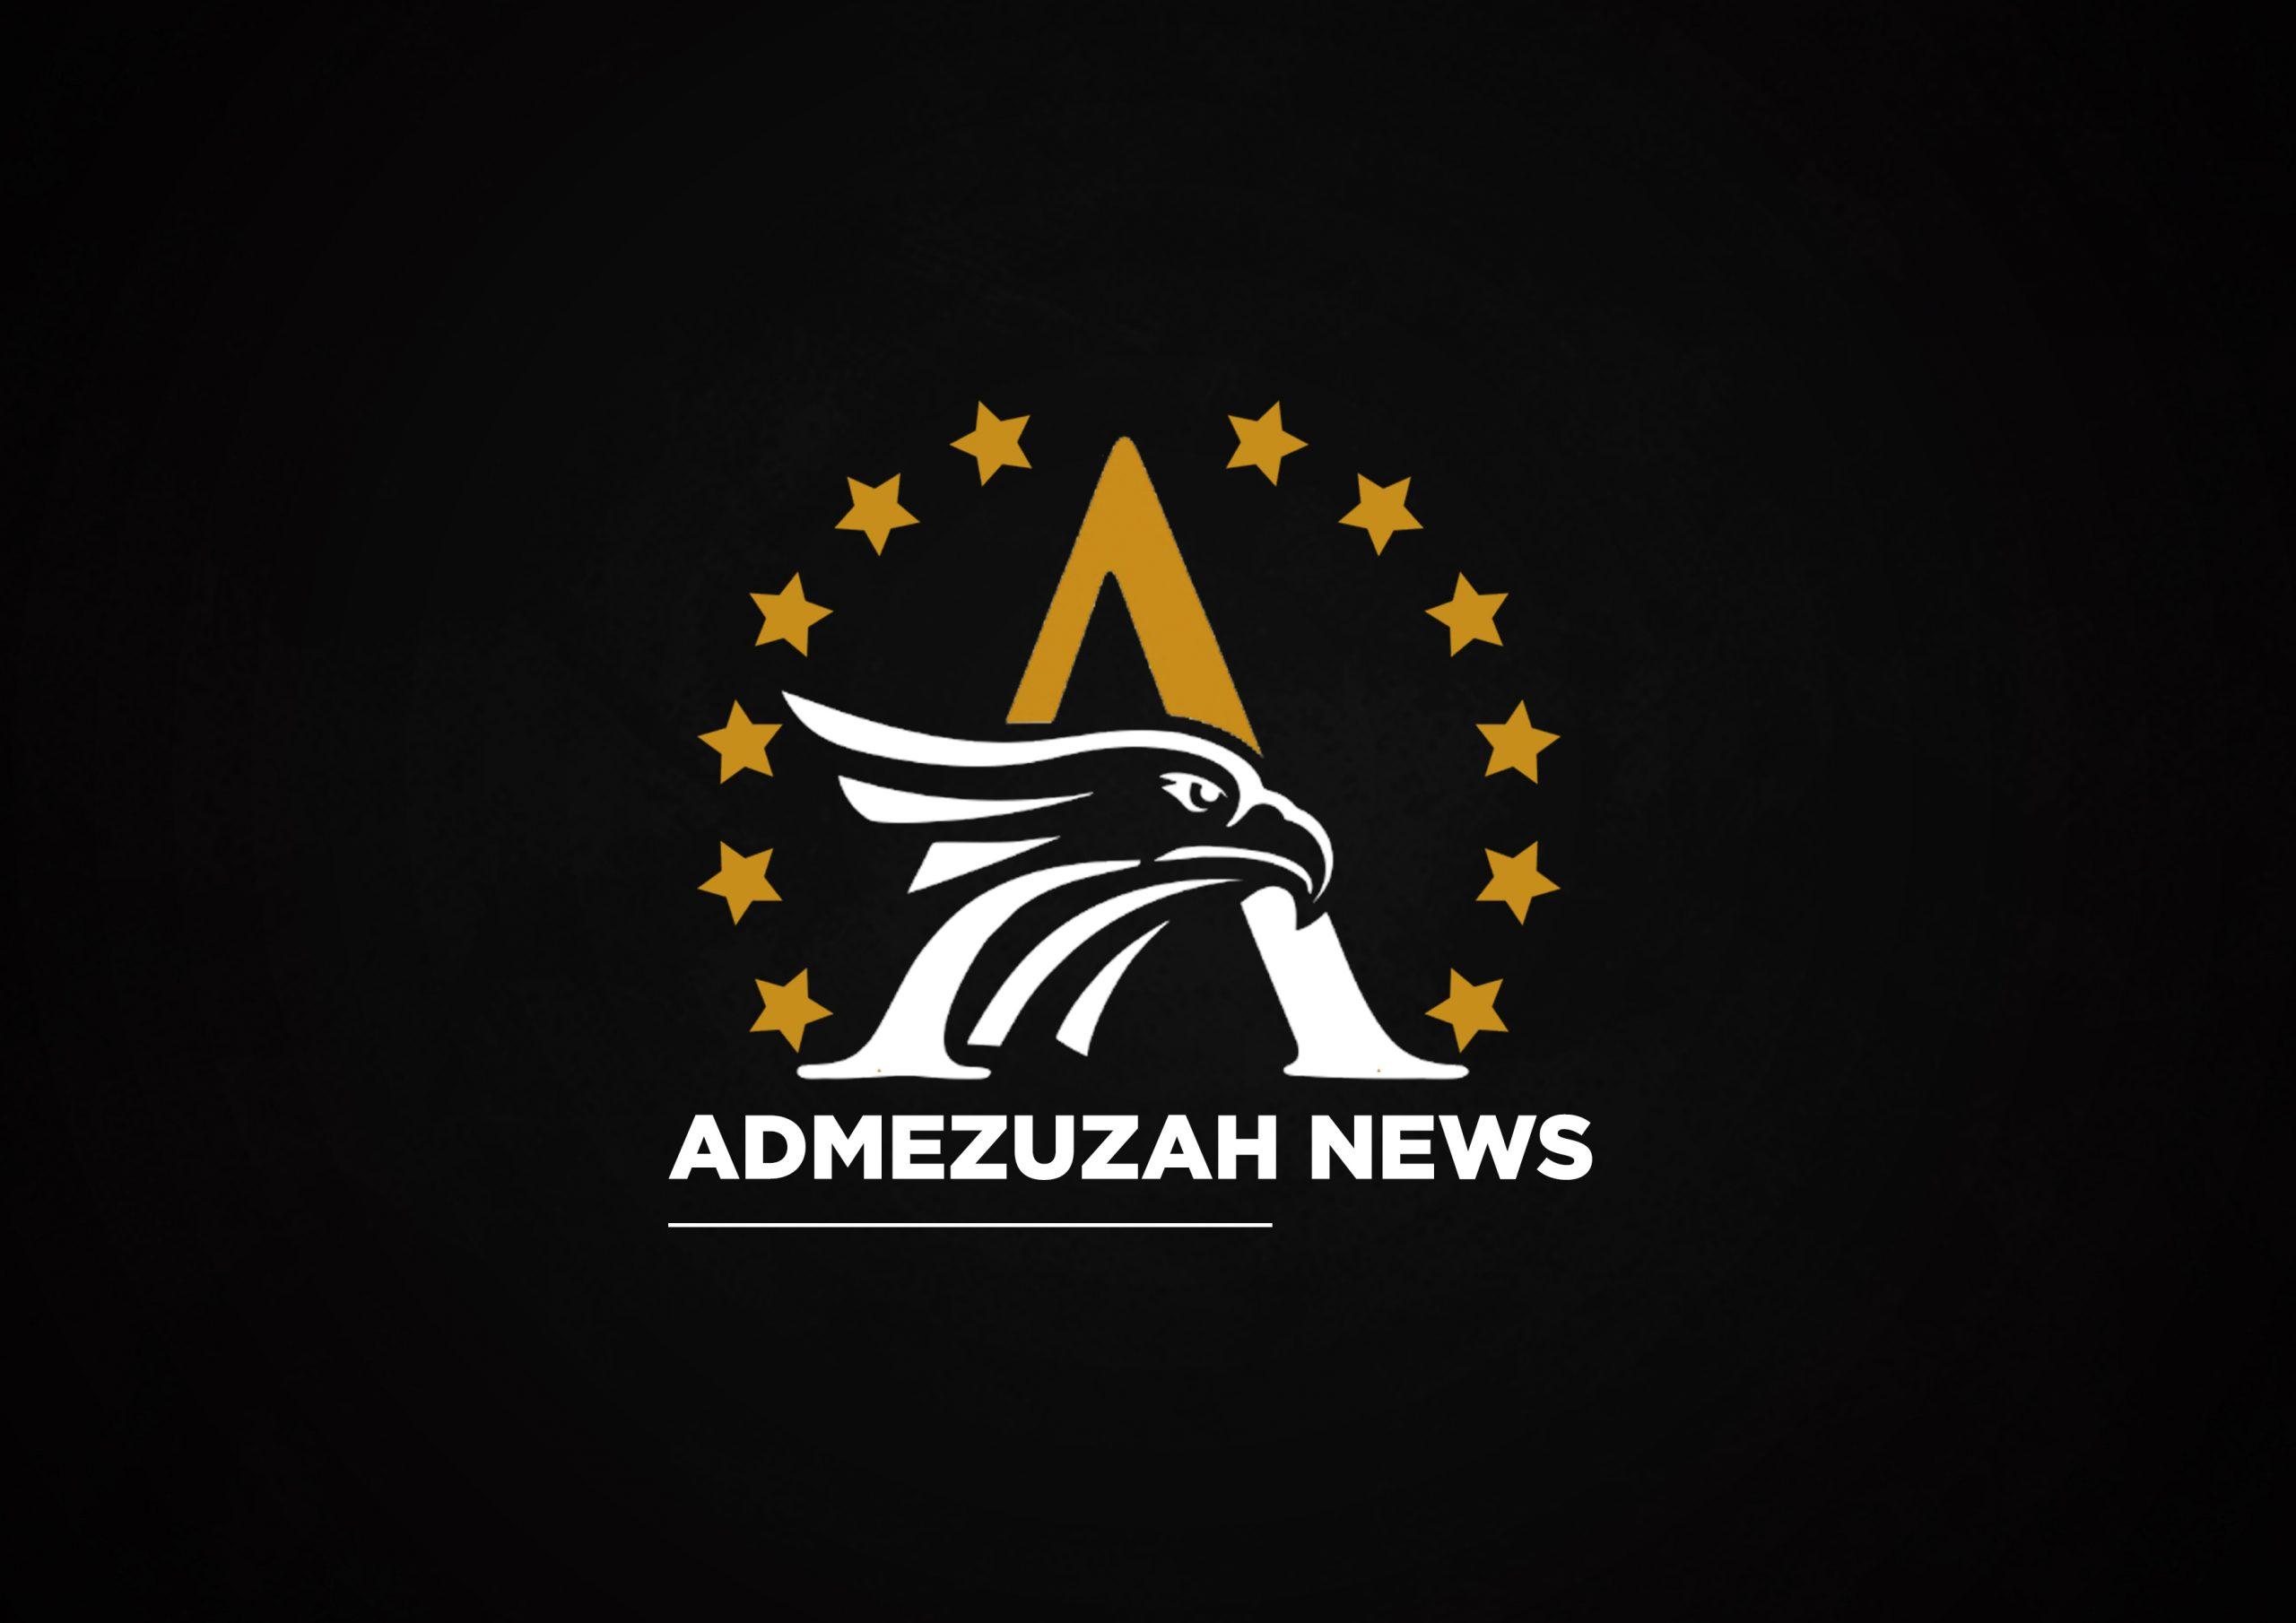 ADMEZUZAH NEWS 2